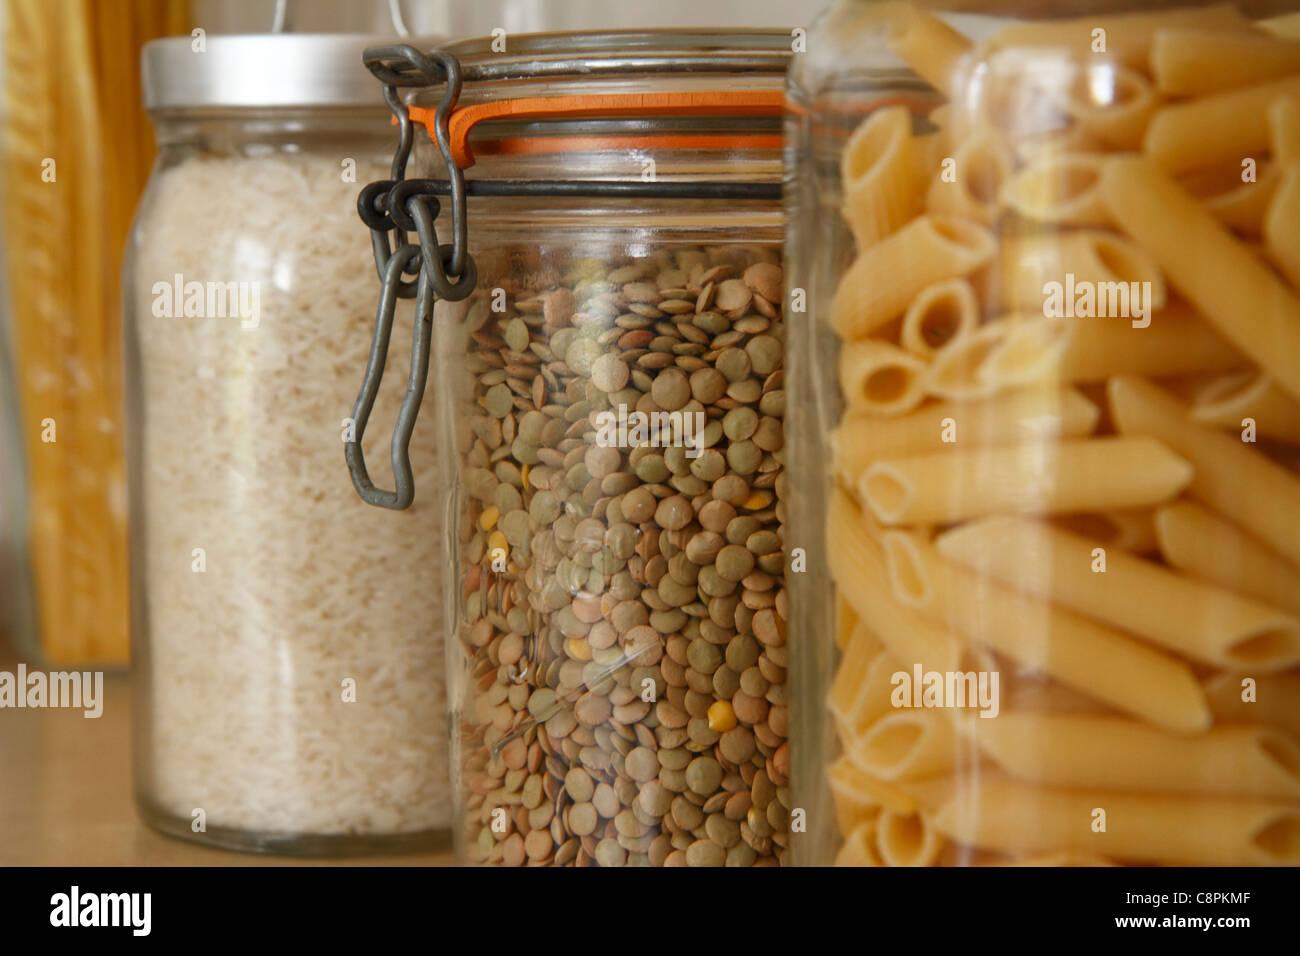 Glass kitchen storage jars - Stock Image